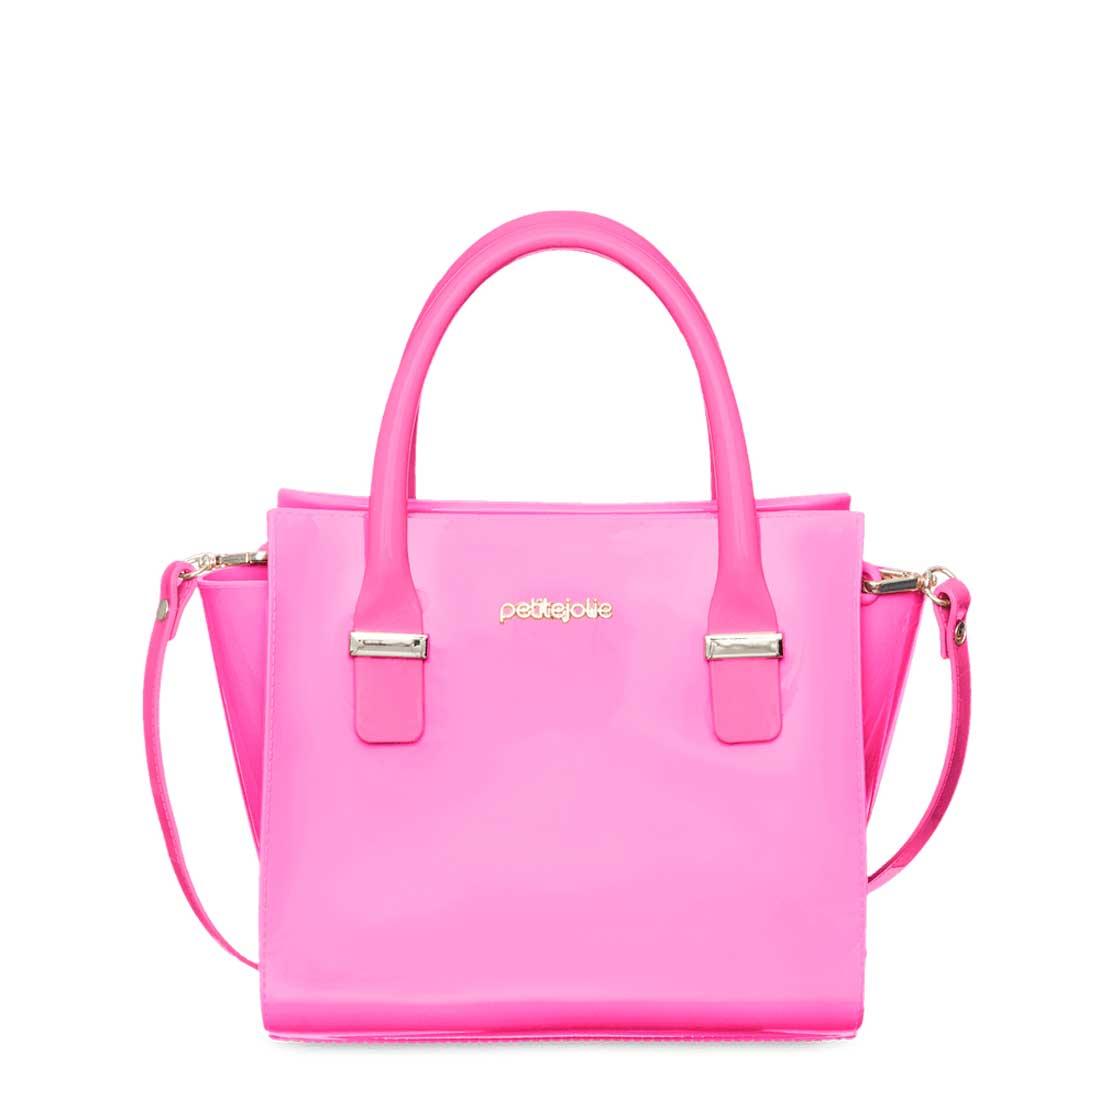 Bolsa Petite Jolie Love - Rosa Neon